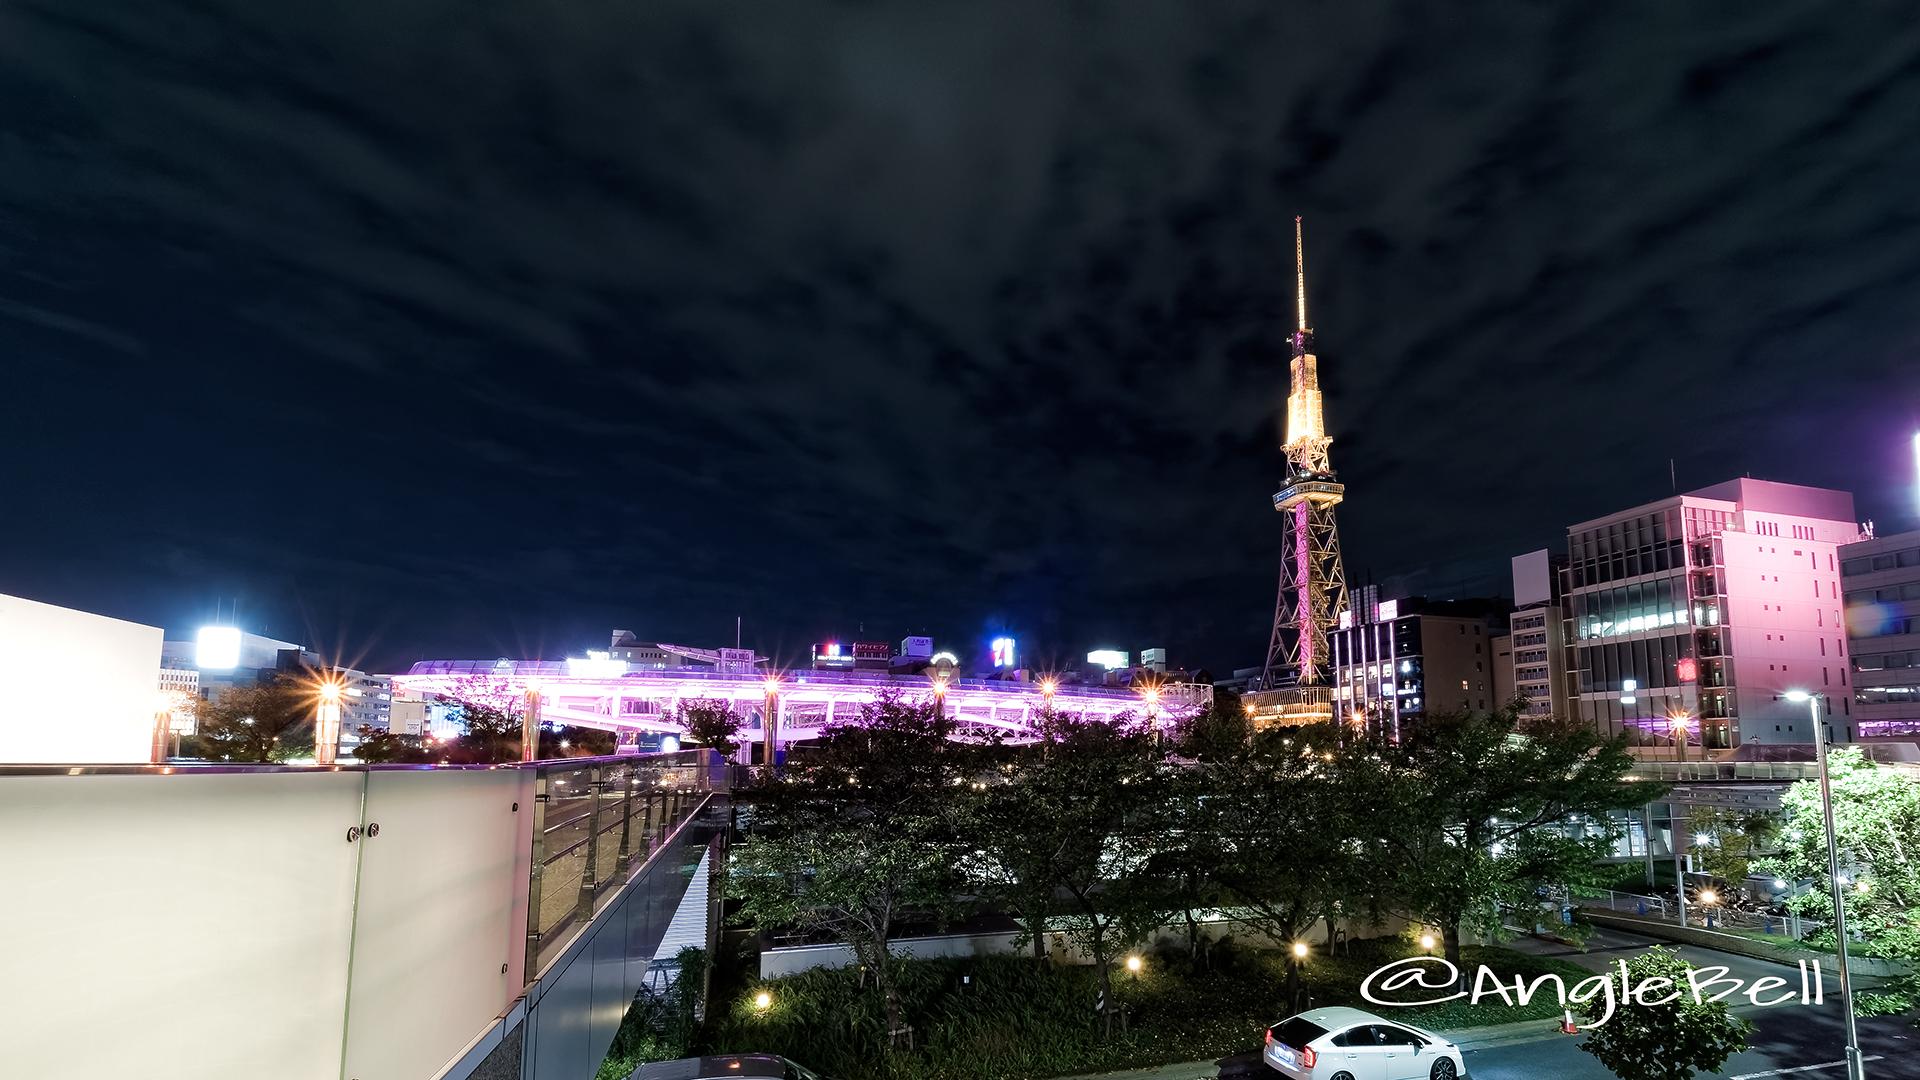 October オアシス21 名古屋テレビ塔 ピンクライトアップ